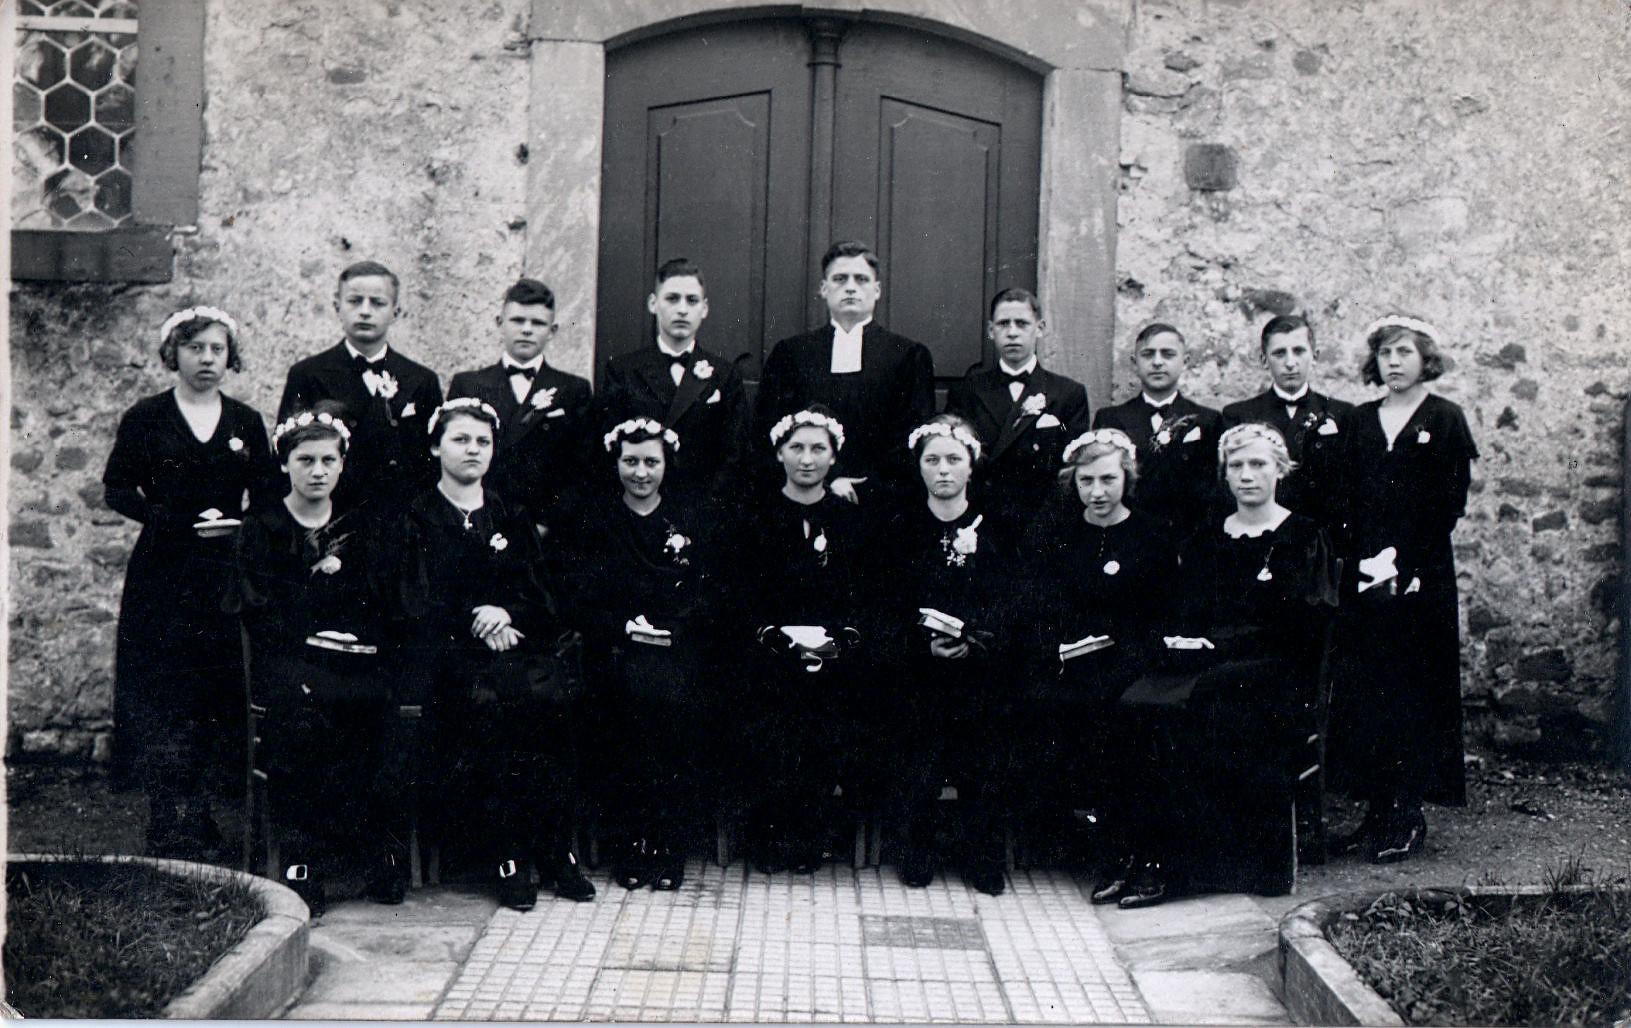 1935 (Bild: Huth,Maria Luise)